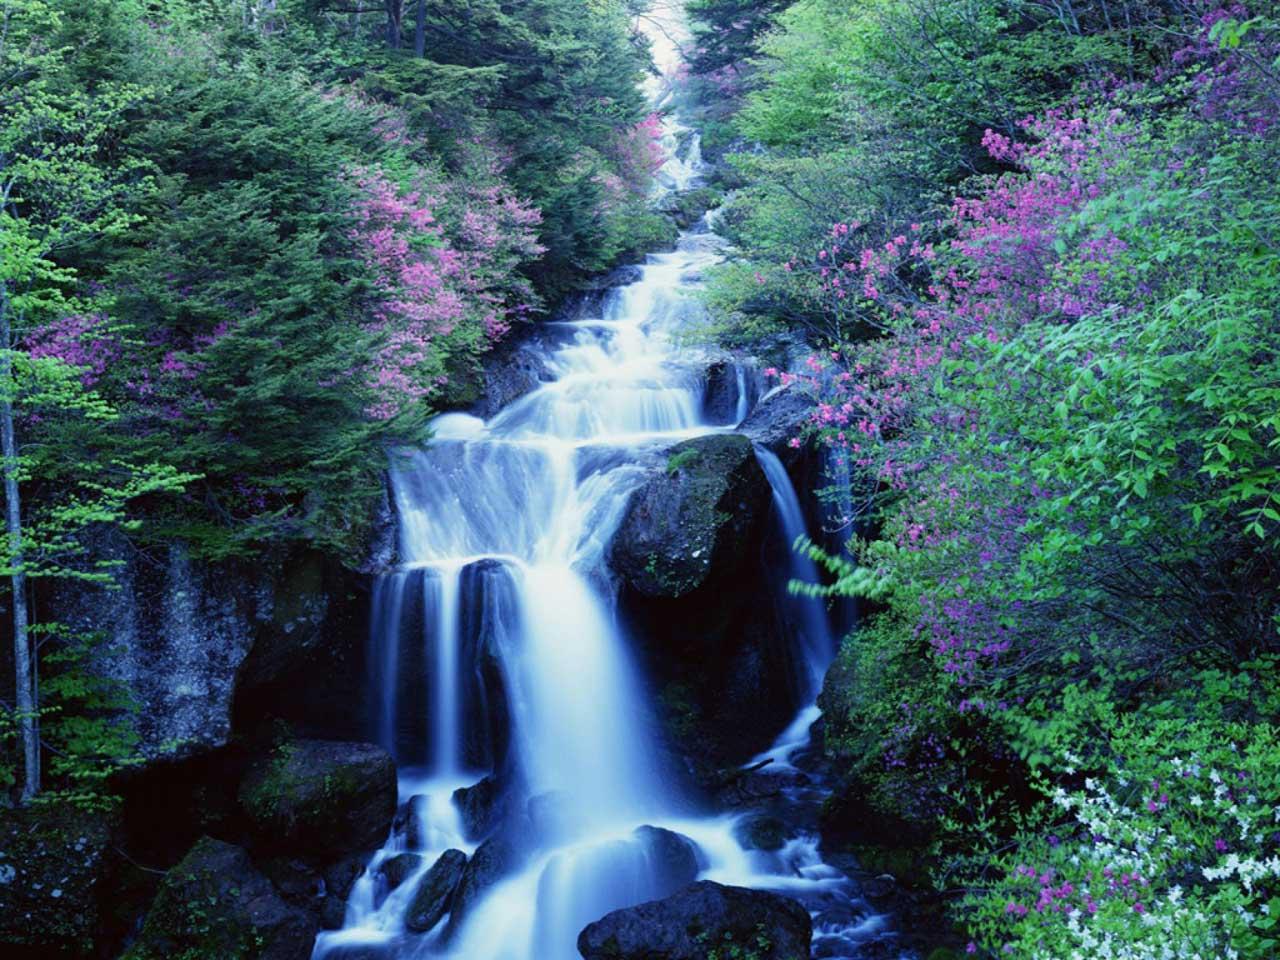 1280x960 desktop wallpaper of blue waterfalls nature vistas 1280x960